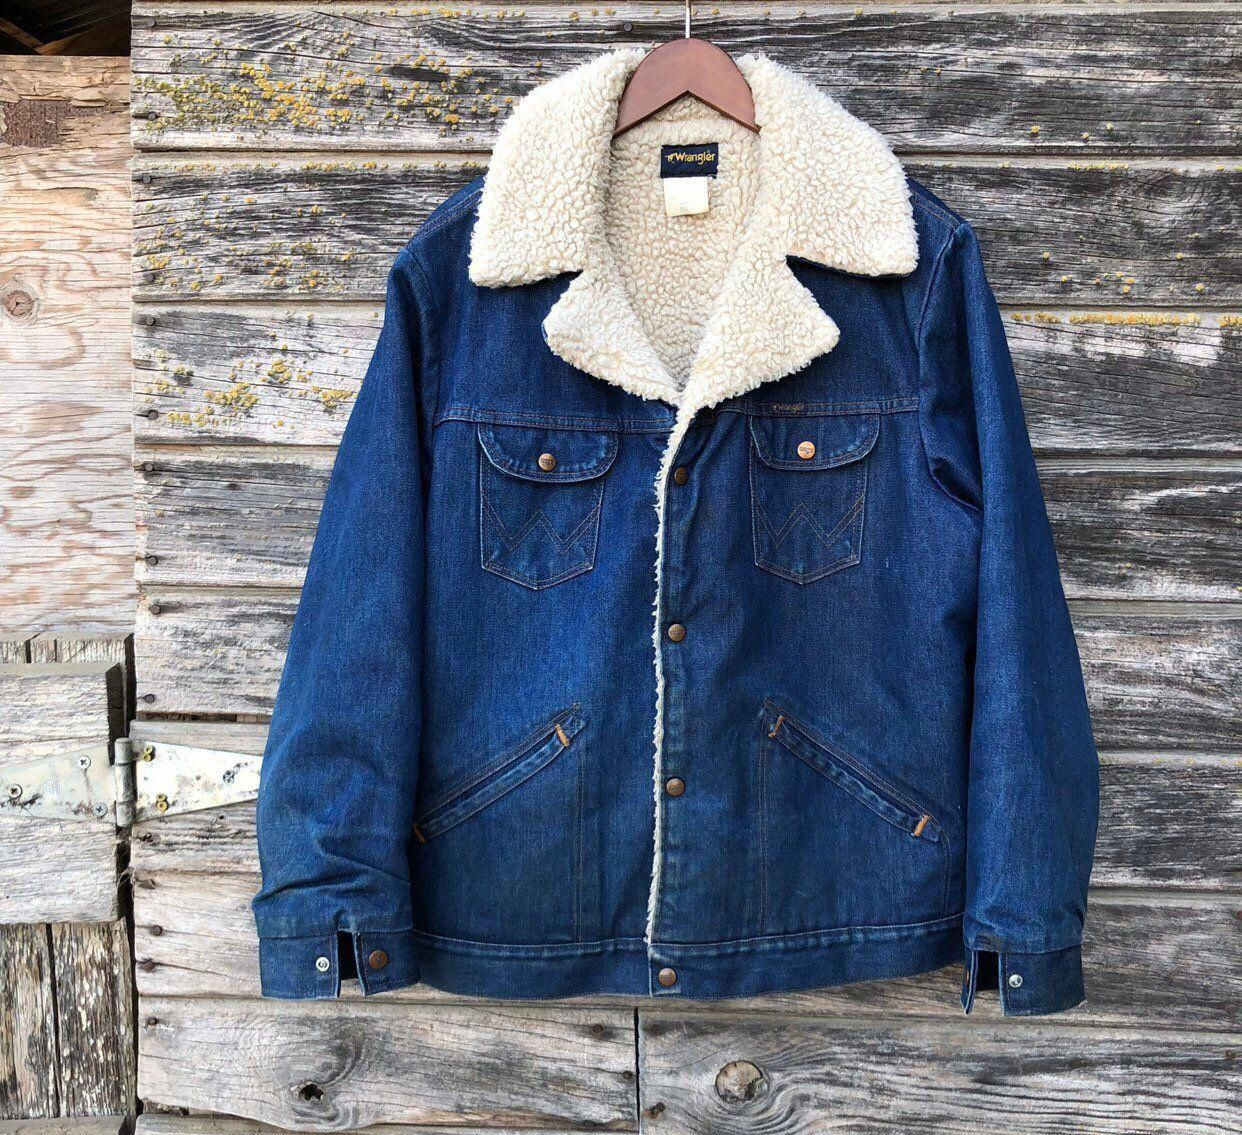 70s Vintage Wrangler Denim Jacket Sherpa Lined 1970s Western Dark Denim Jean Jacket Heavy Warm Coat Grunge Distressed Vtg M Denim Jacket Denim Fashion Jackets [ 1135 x 1242 Pixel ]